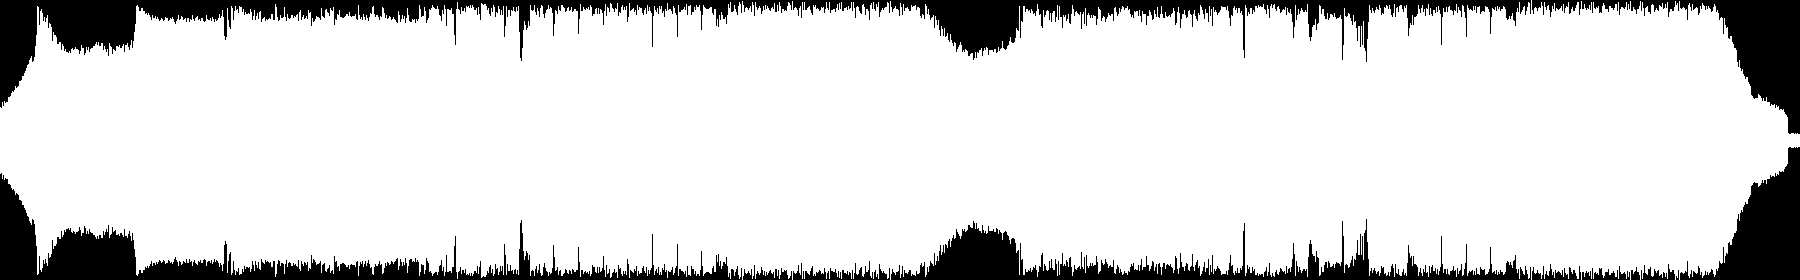 Imaginate - Elements Series - Terra audio waveform